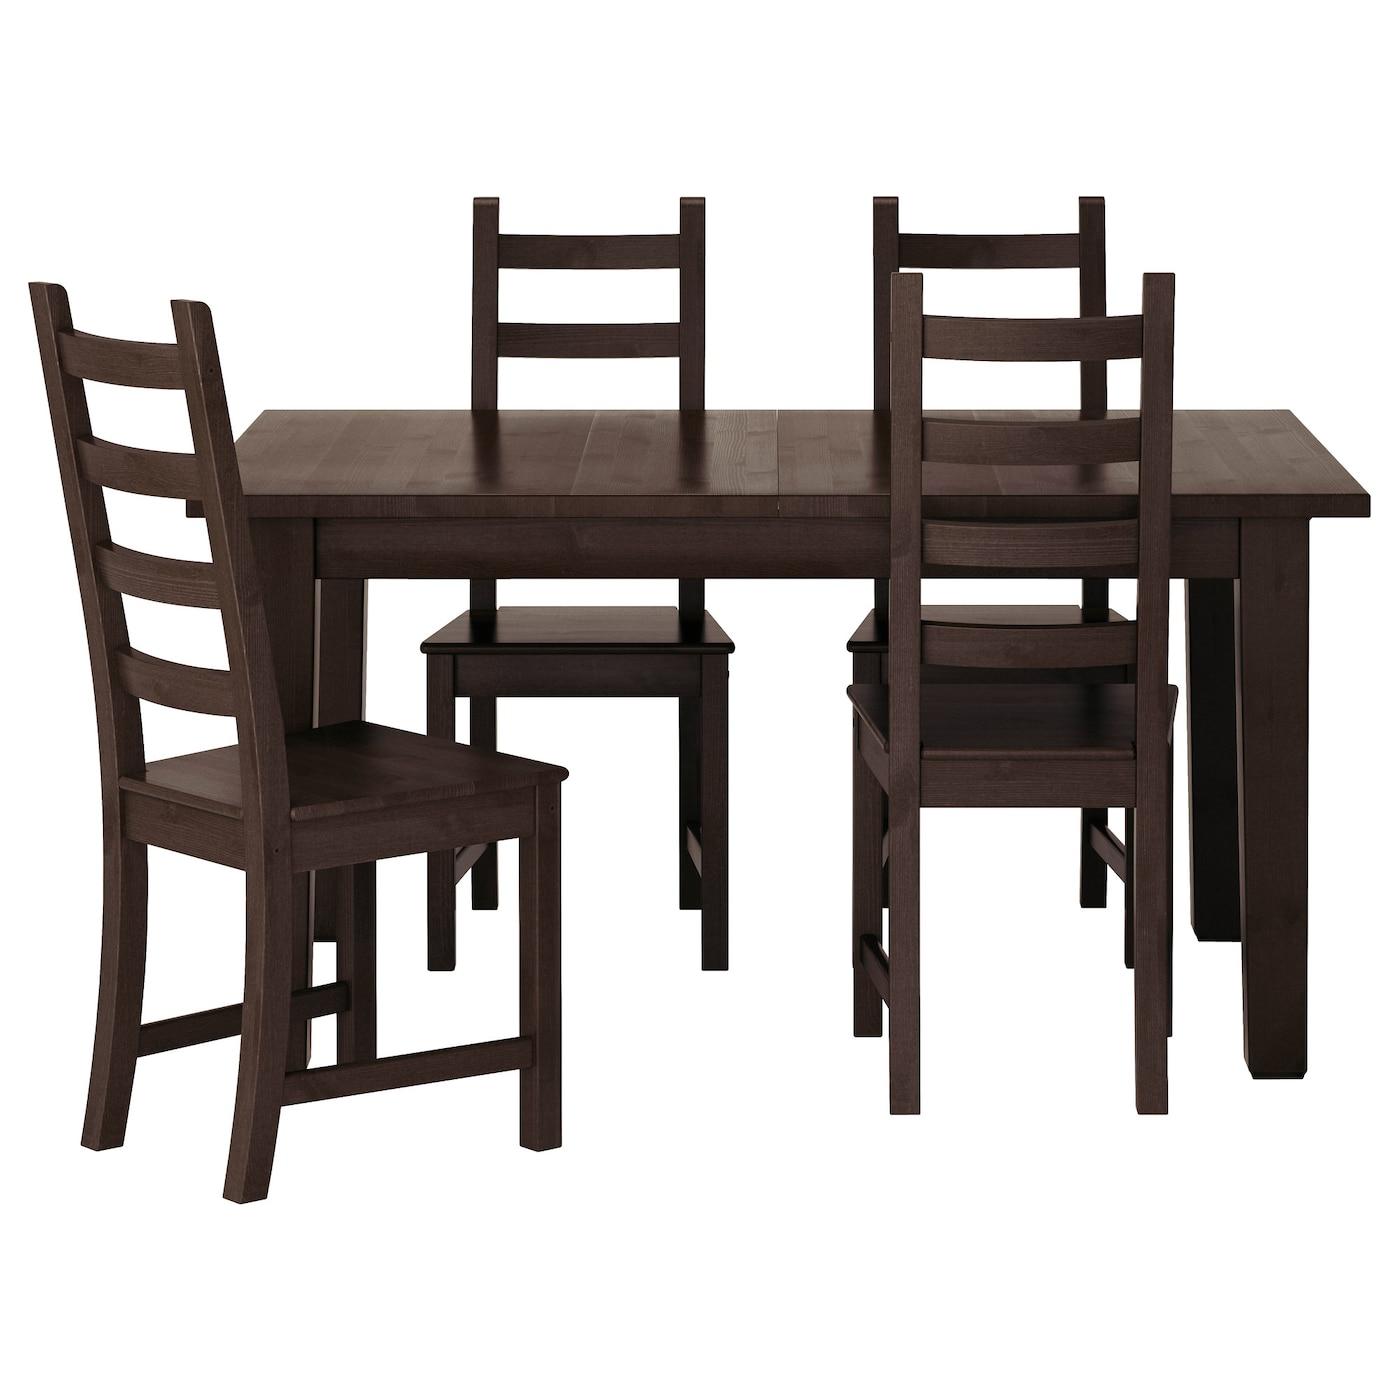 ensembles tables et chaises max 4 pers ikea. Black Bedroom Furniture Sets. Home Design Ideas